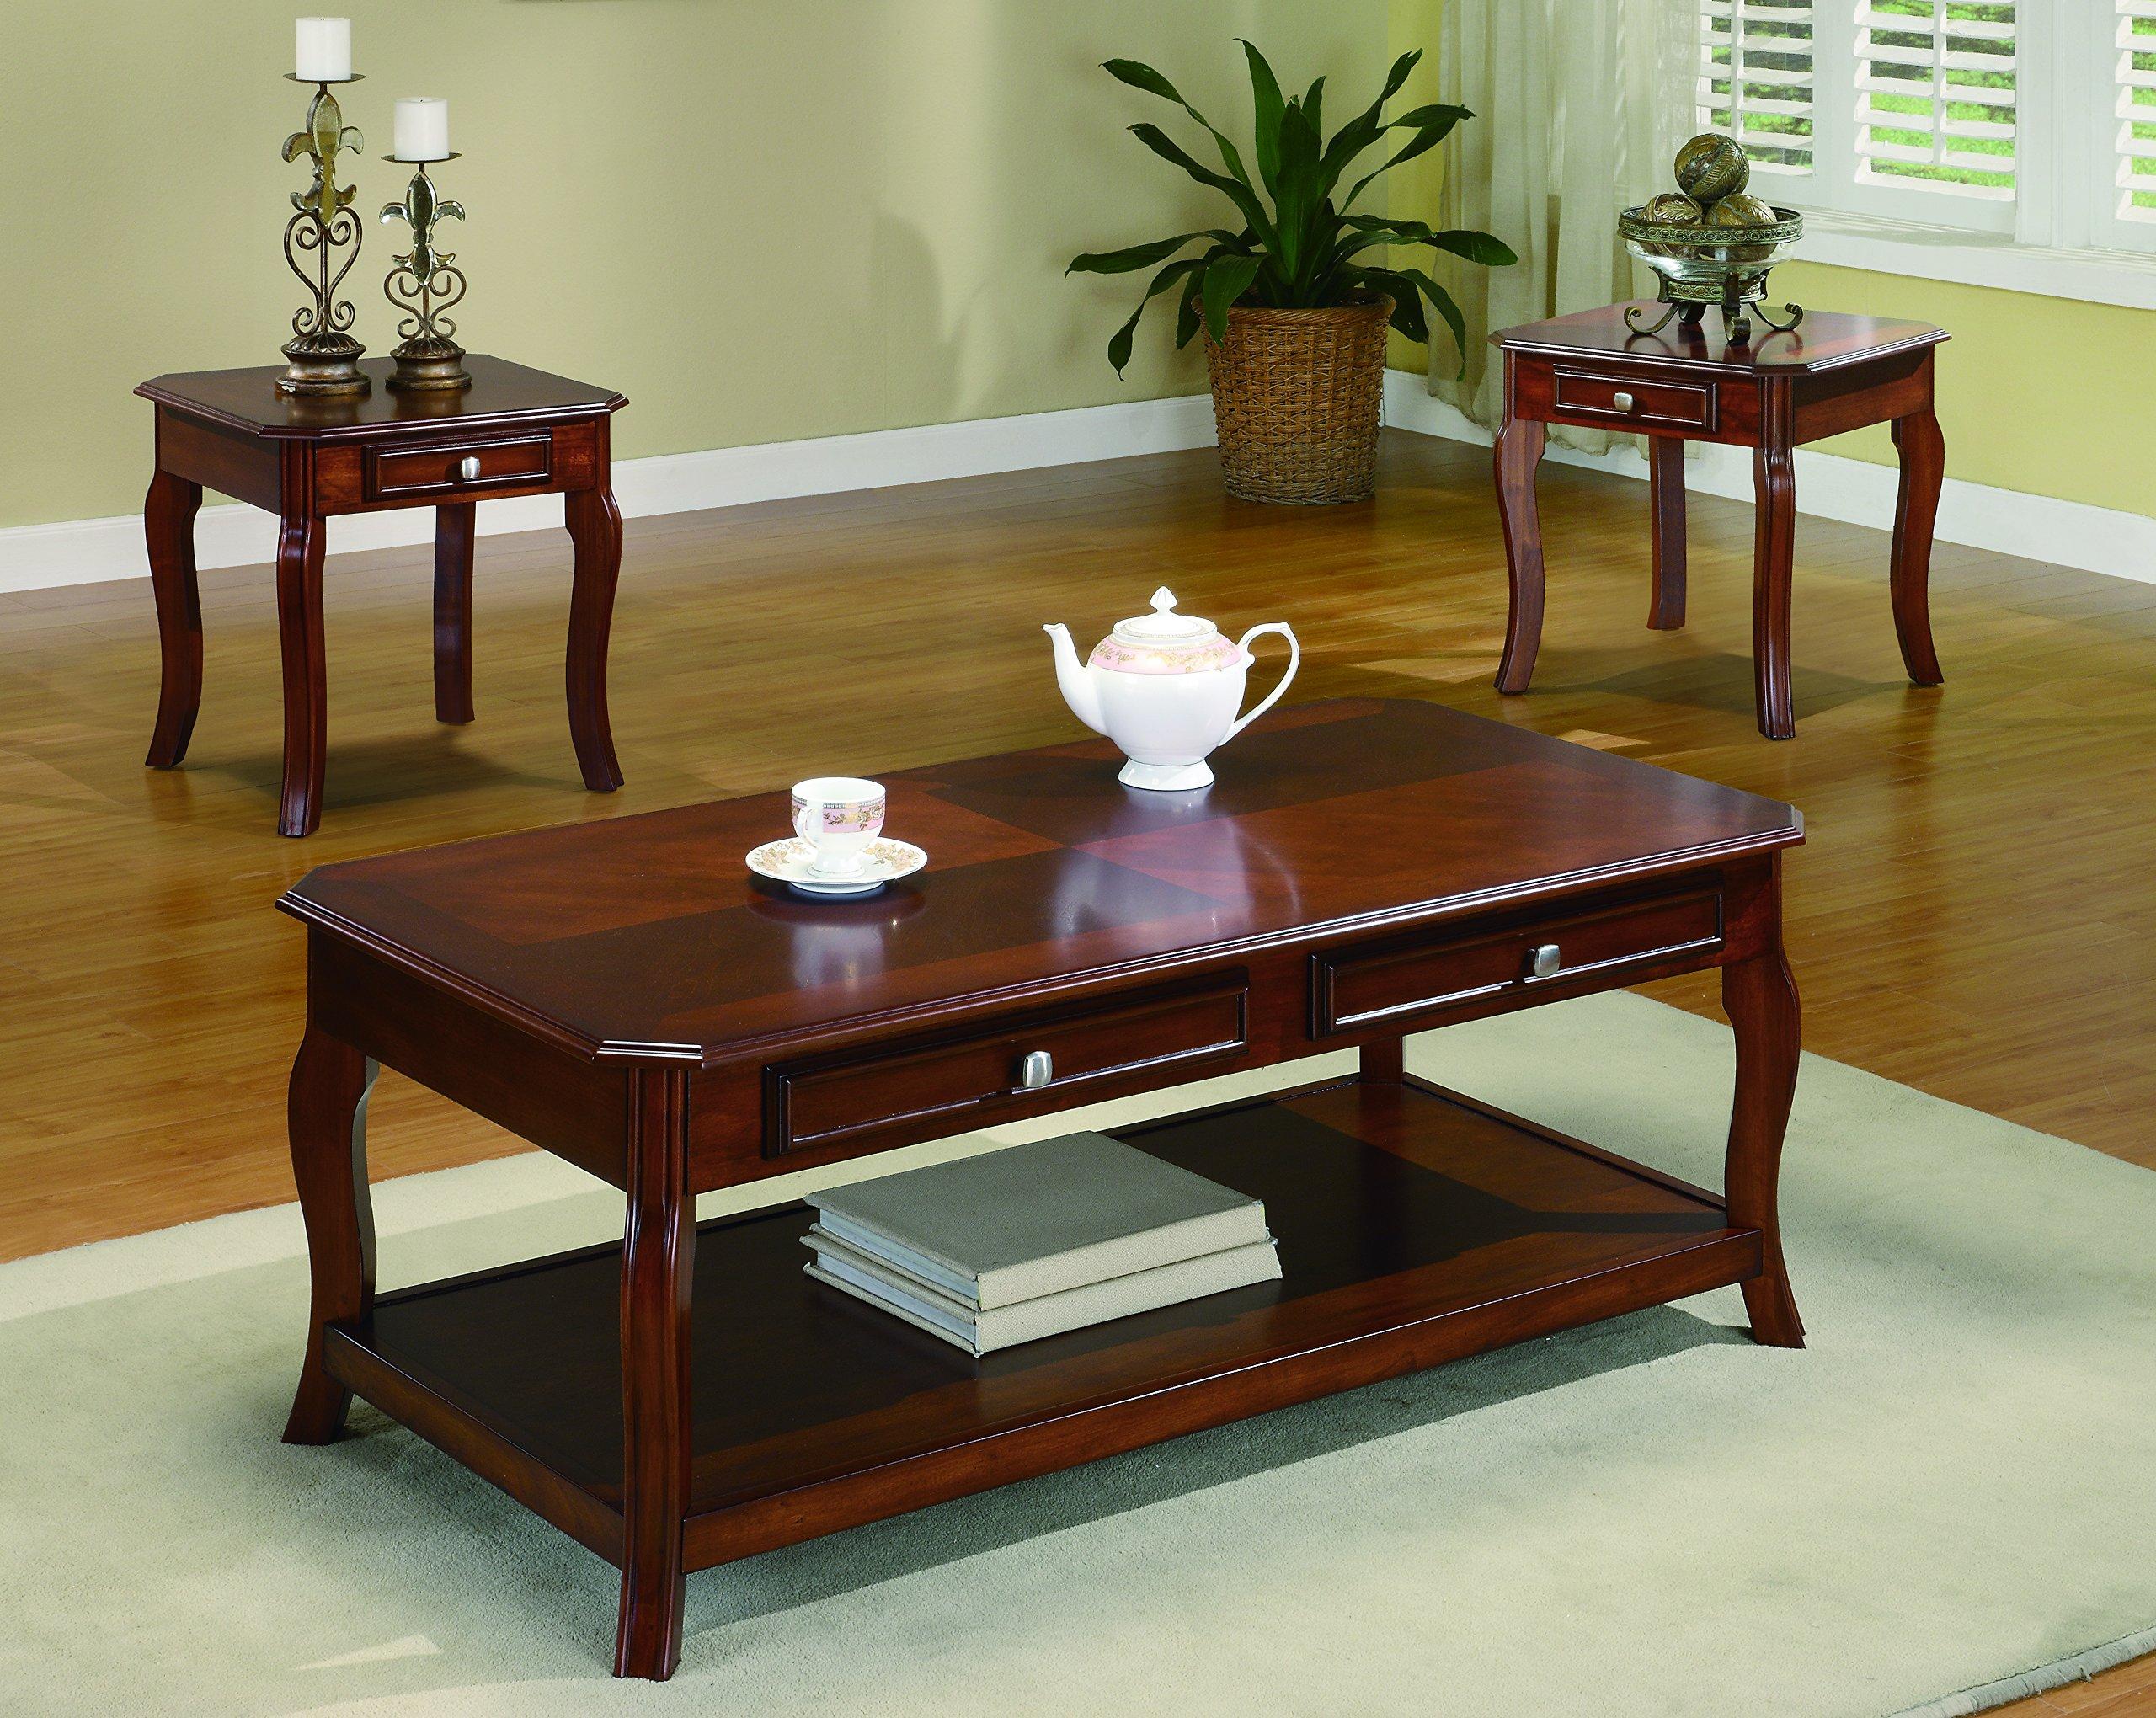 Coaster Home Furnishings 3 Piece Table Group-Warm Bourbon finish